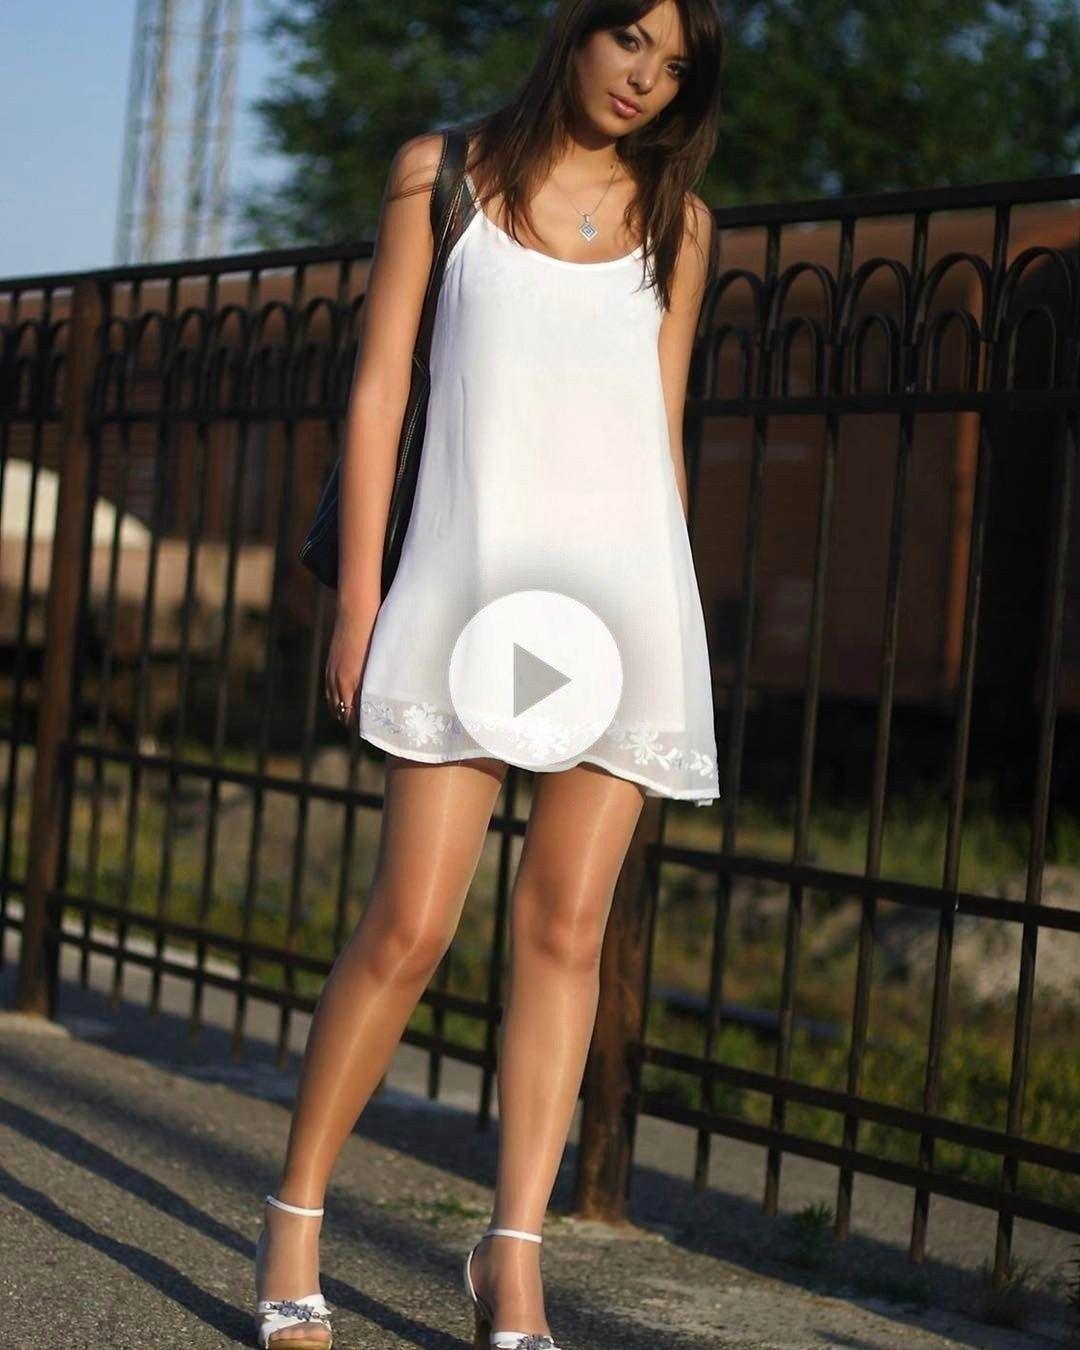 Voyeur classic panties asian